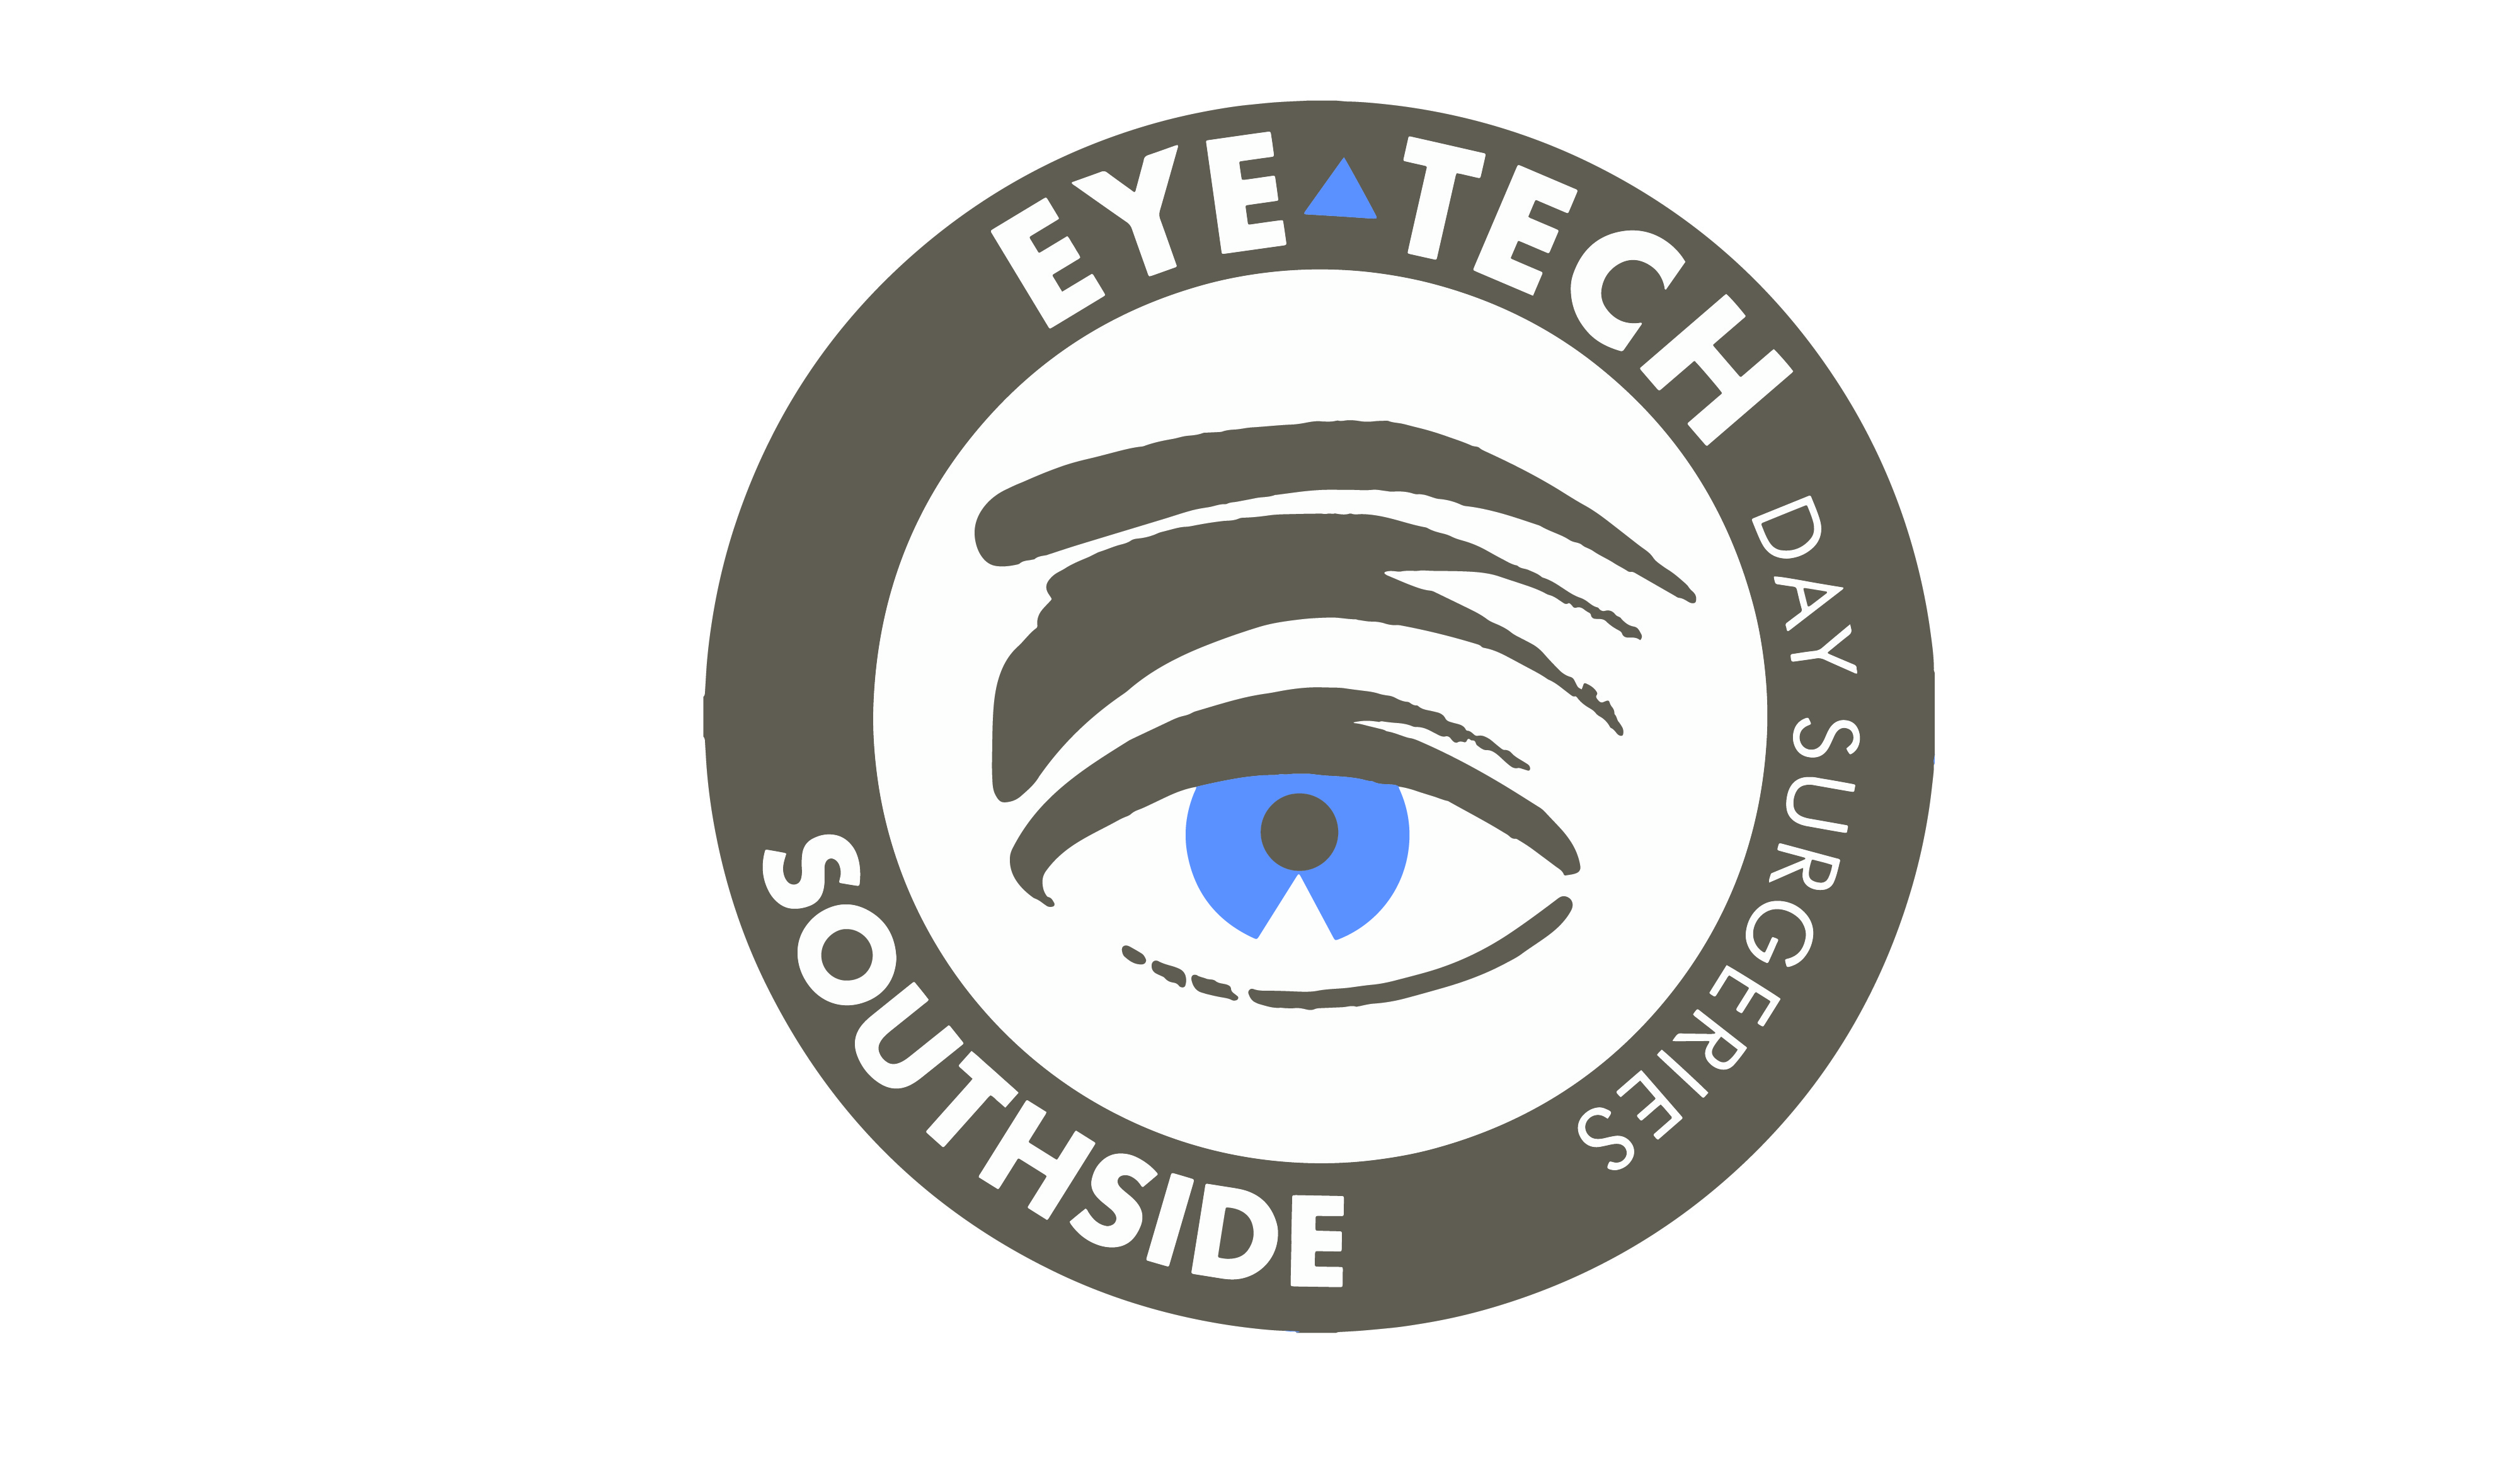 Eye Tech Day Surgeries Southside image